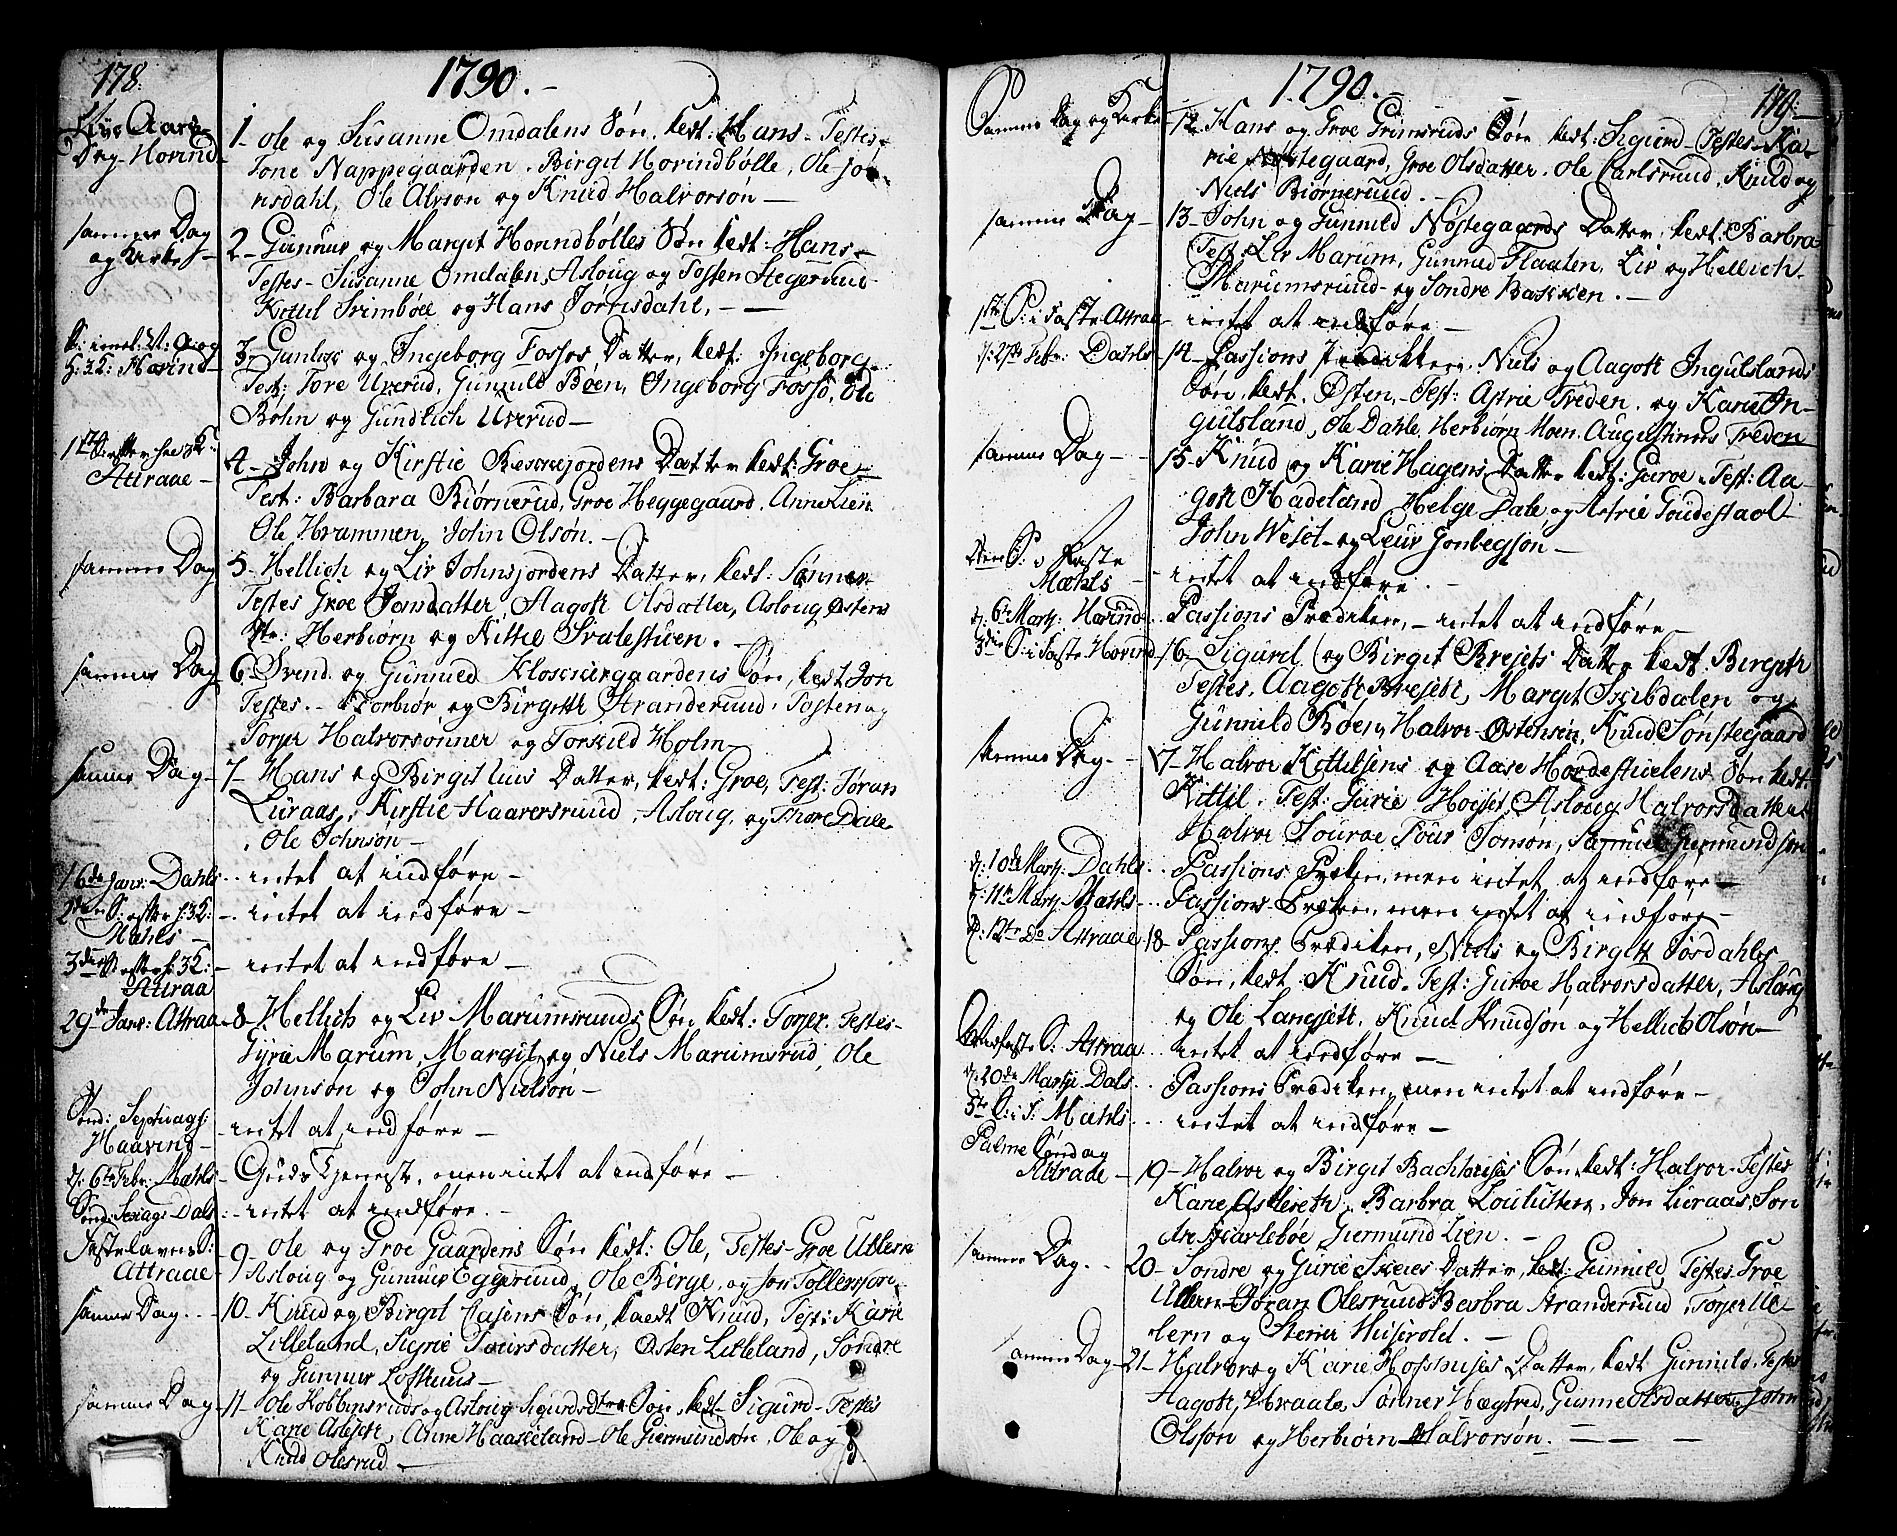 SAKO, Tinn kirkebøker, F/Fa/L0002: Ministerialbok nr. I 2, 1757-1810, s. 178-179